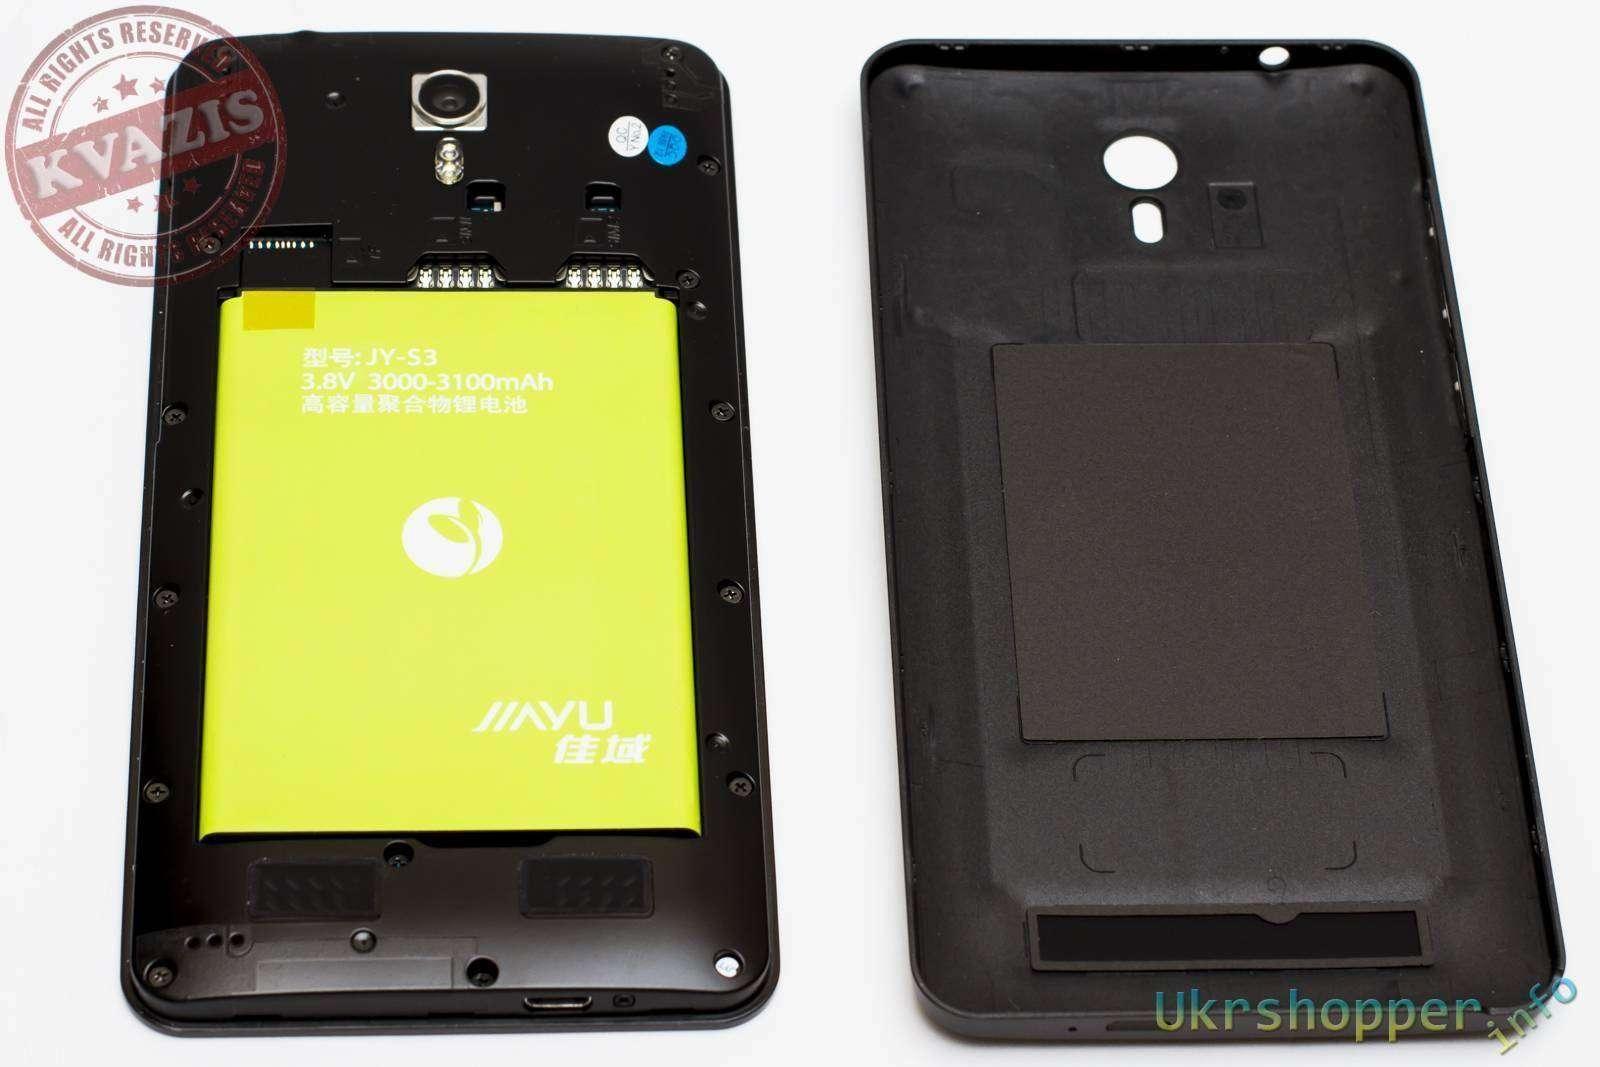 Aliexpress: Обзор фаблета Jiayu S3, LTE 2GB RAM